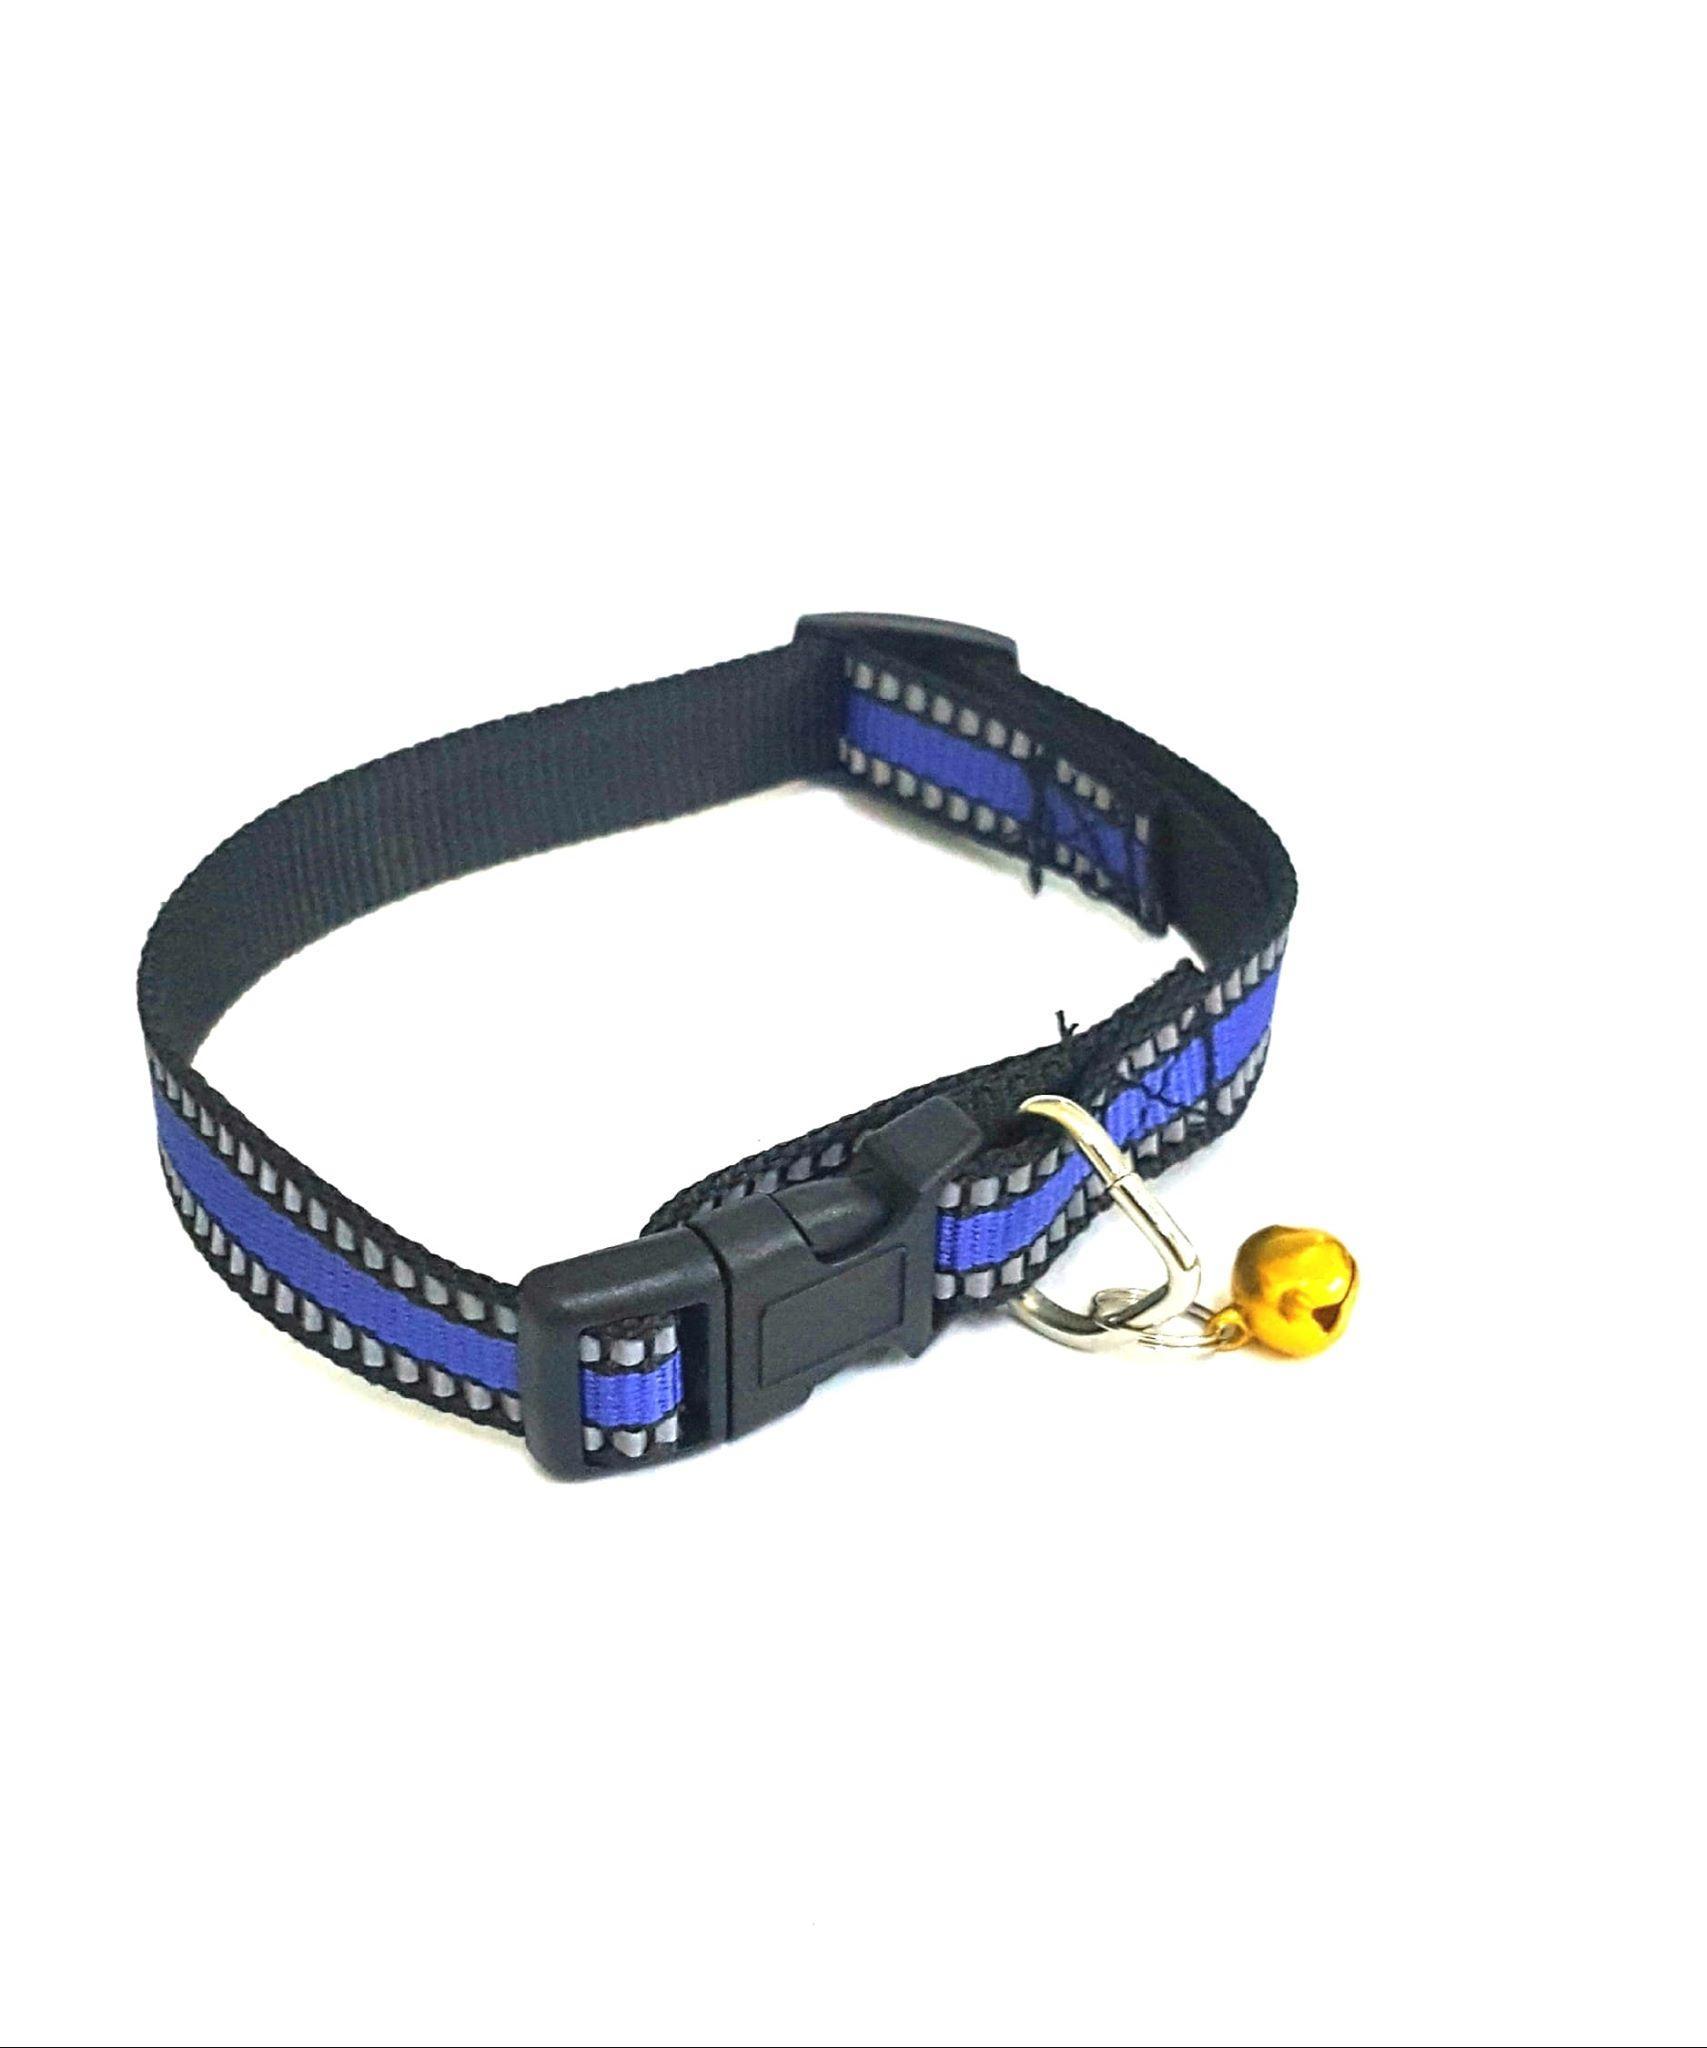 Buy Collars at Best Price Online